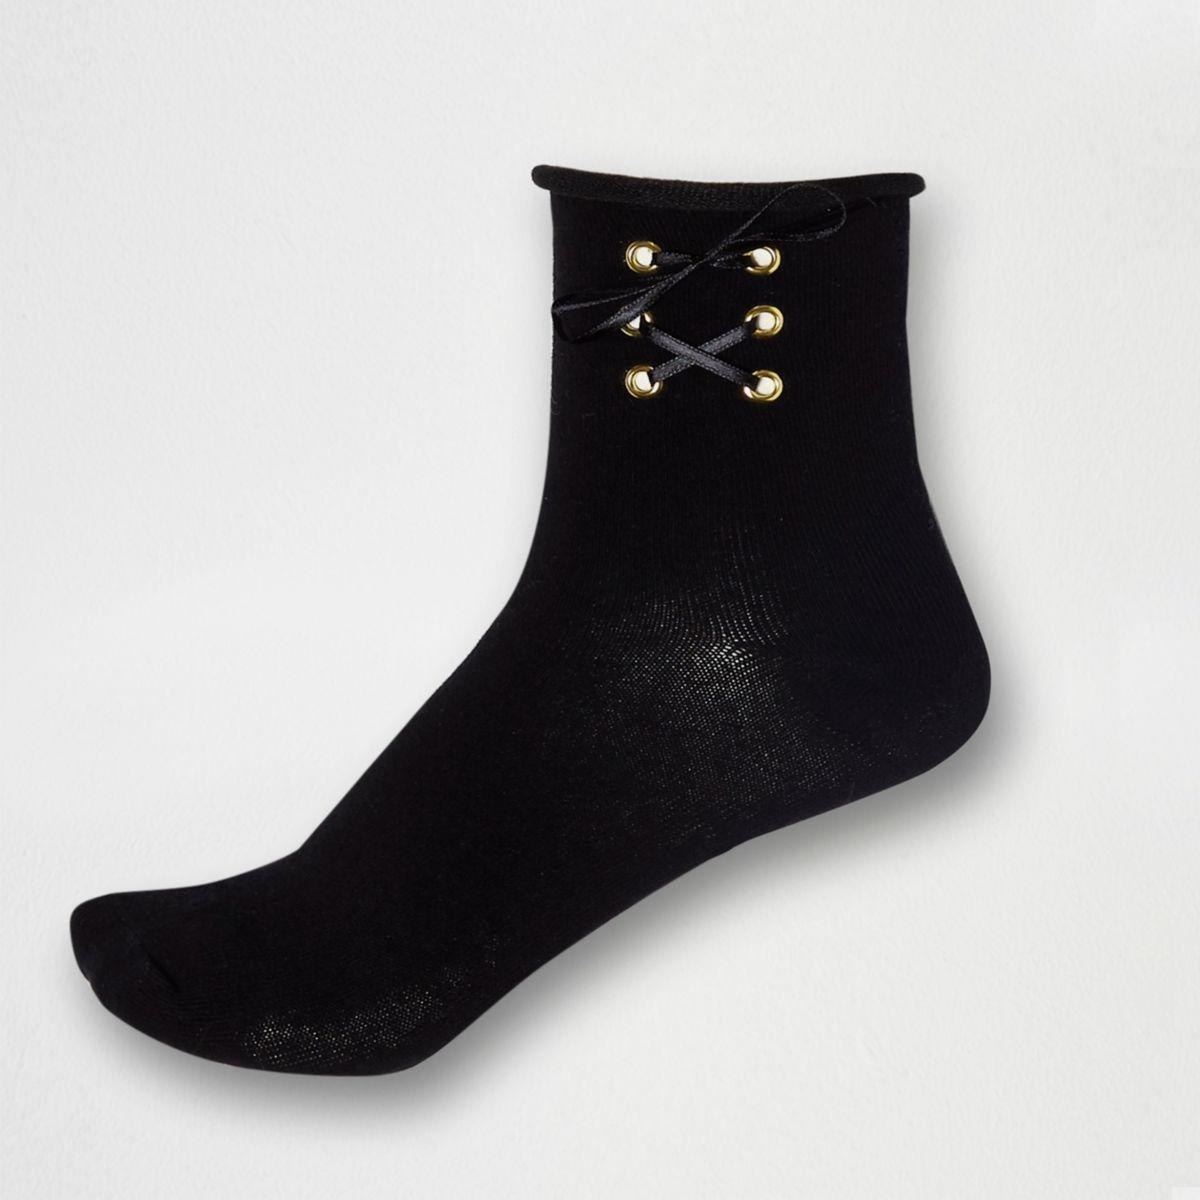 Black lace-up ankle socks